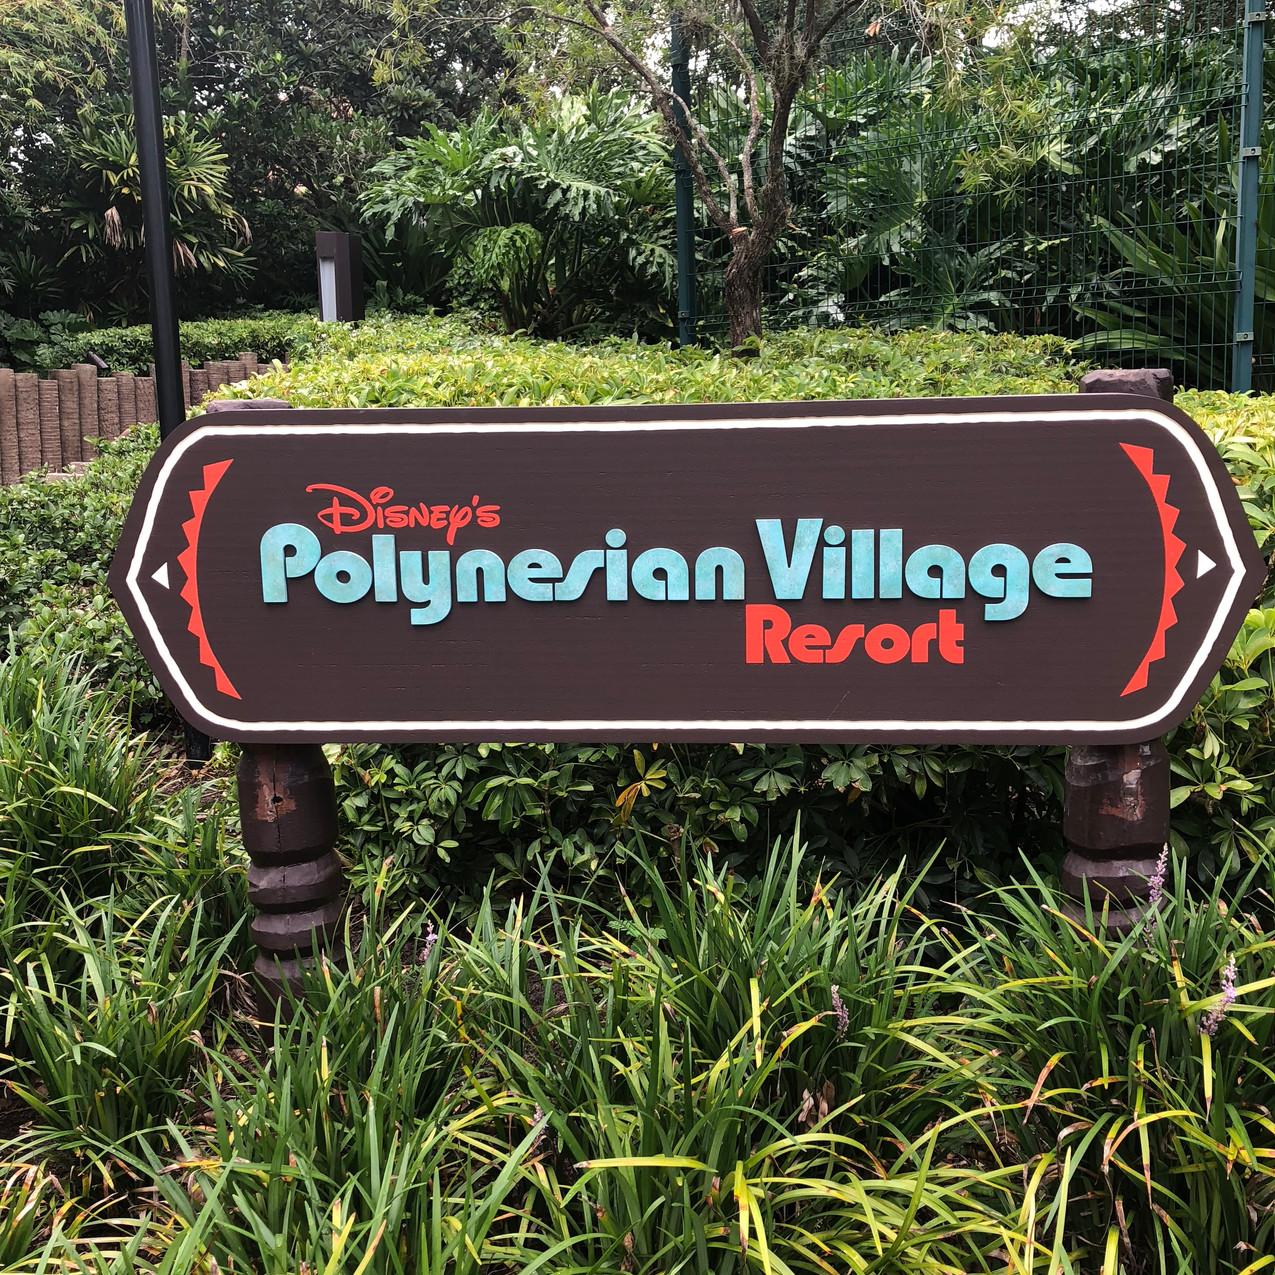 Disney's Polynesian Village Resort sign